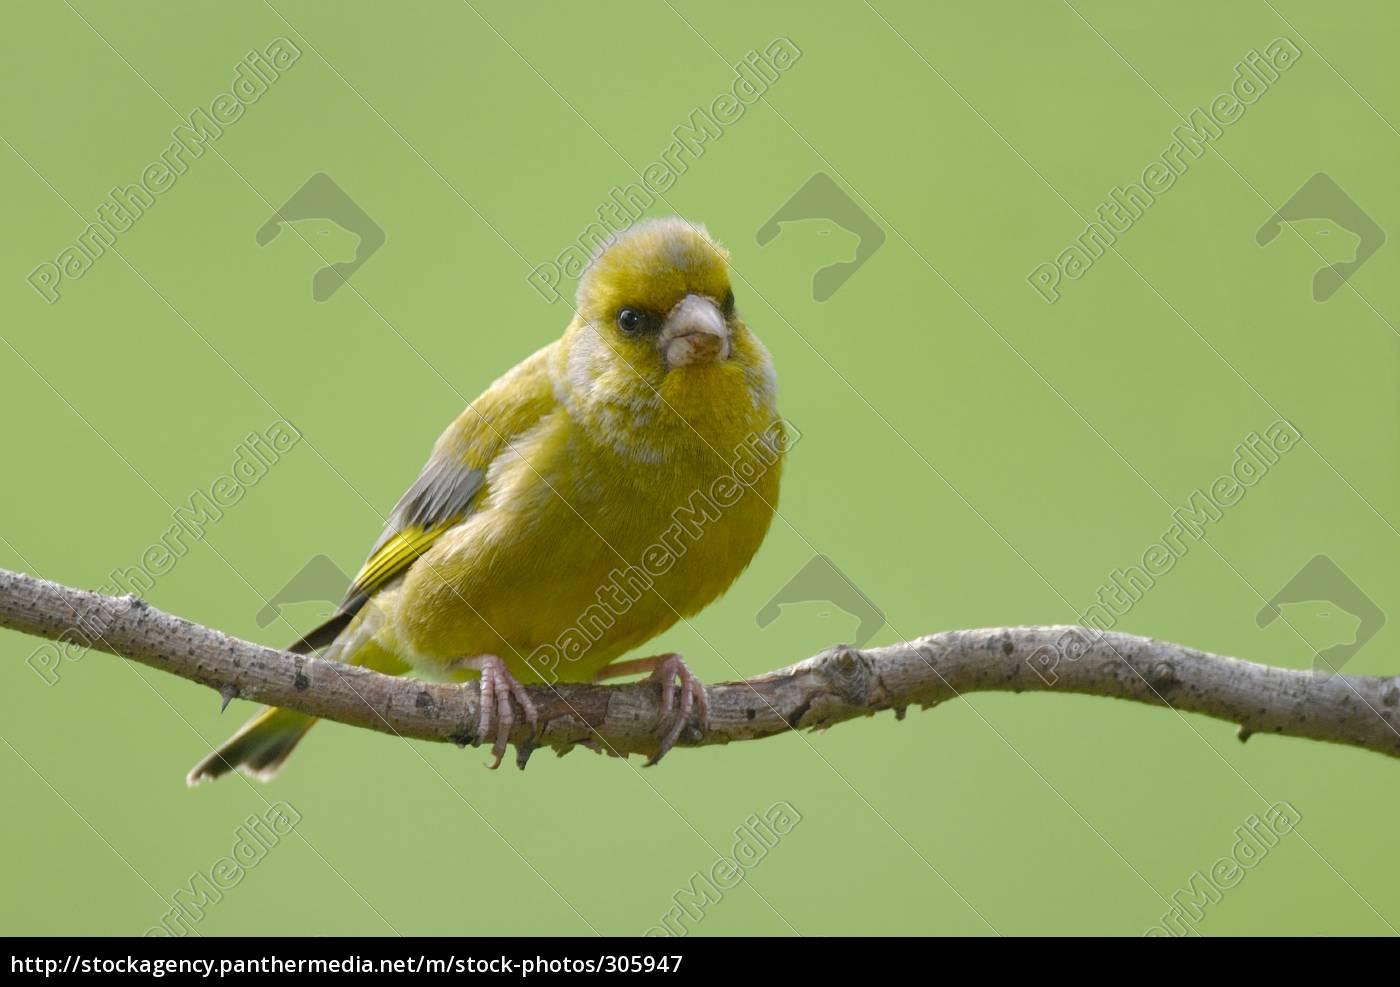 greenfinch, carduelis, chloris - 305947